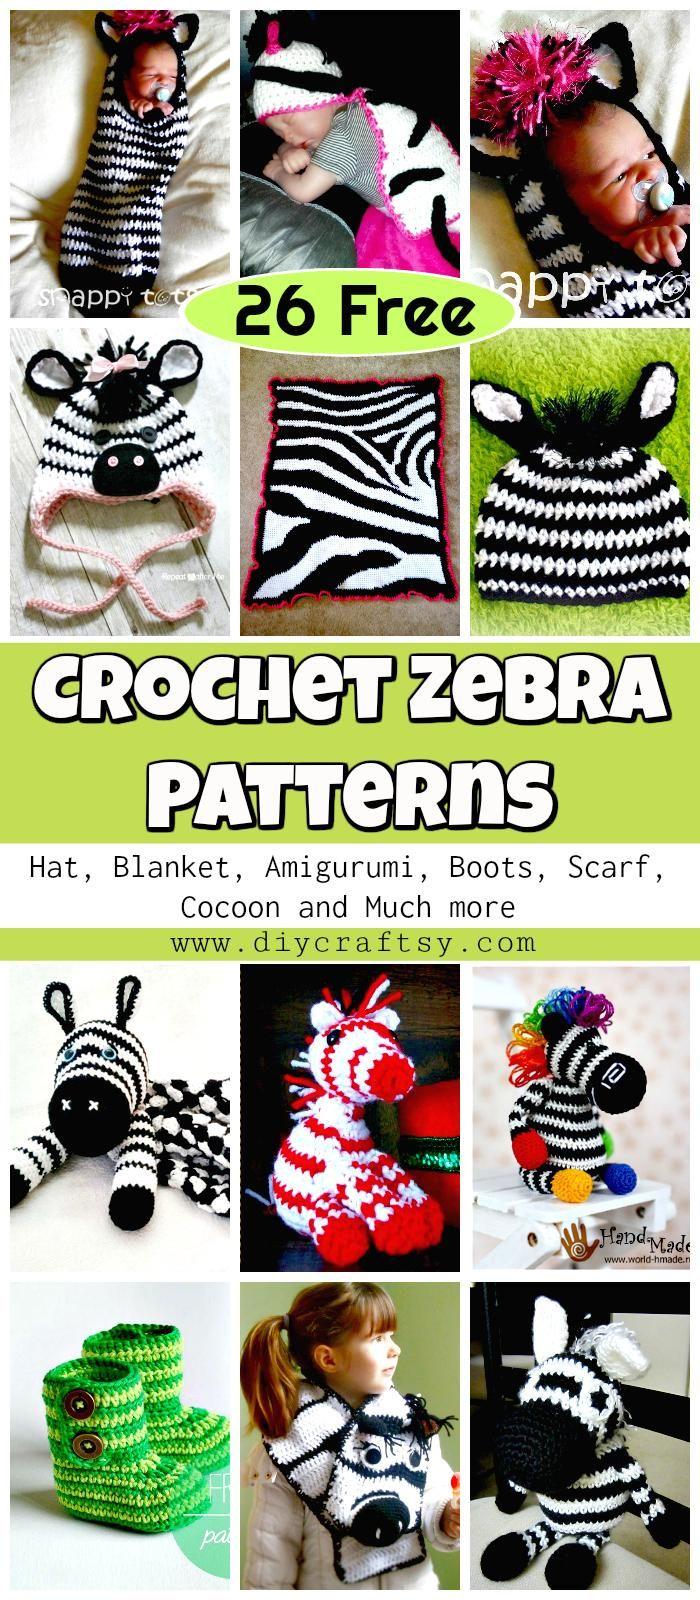 26 Free Crochet Zebra Patterns / Hat, Blanket, Amigurumi | Patrón ...